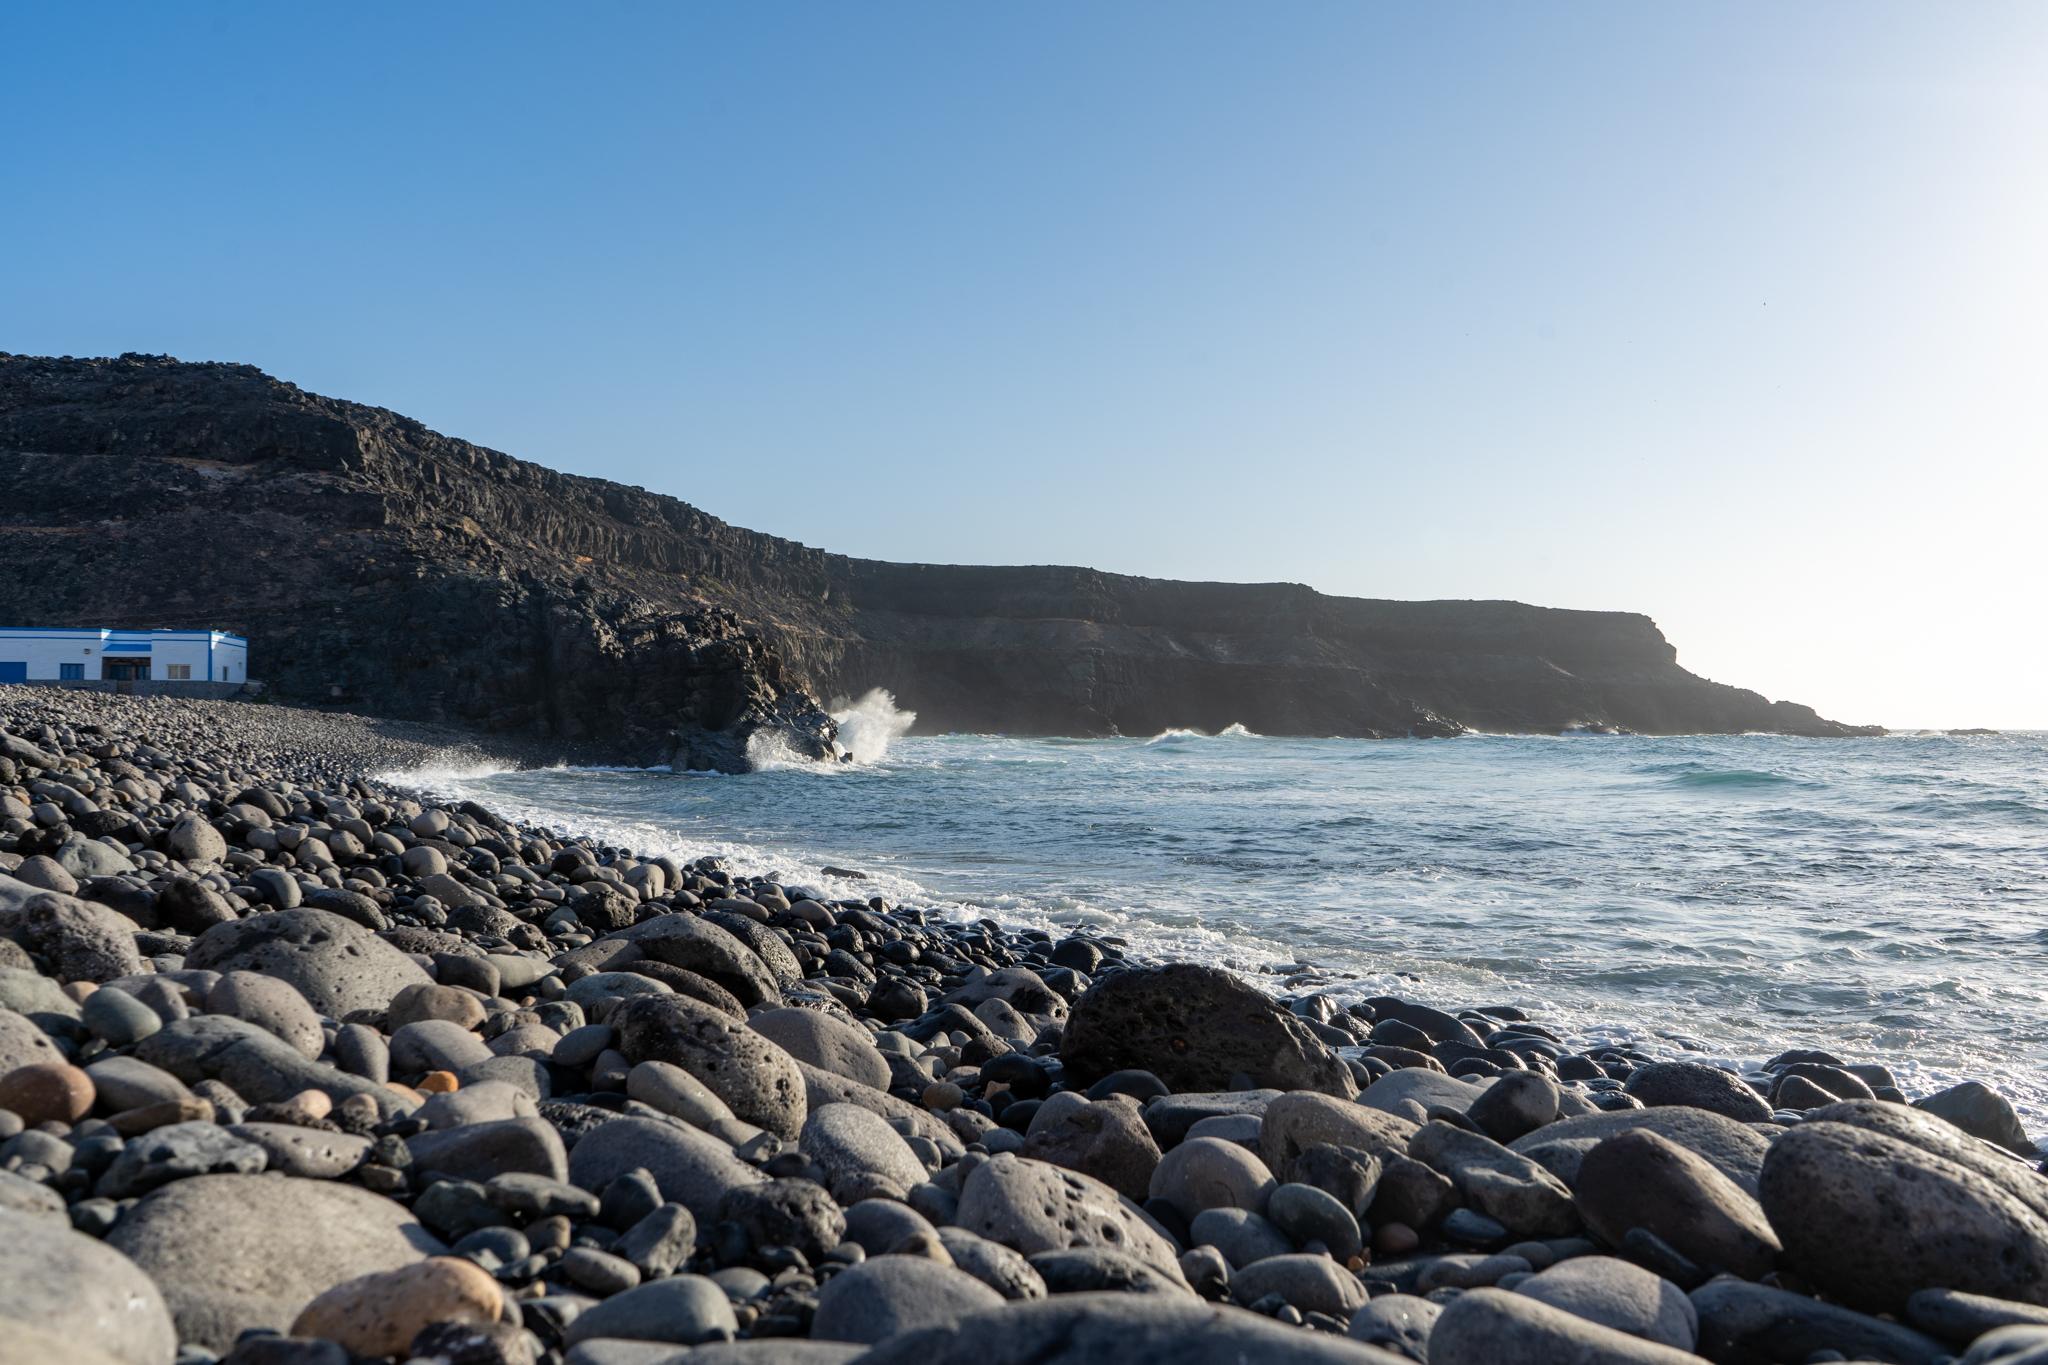 Los Molinos auf Fuerteventura